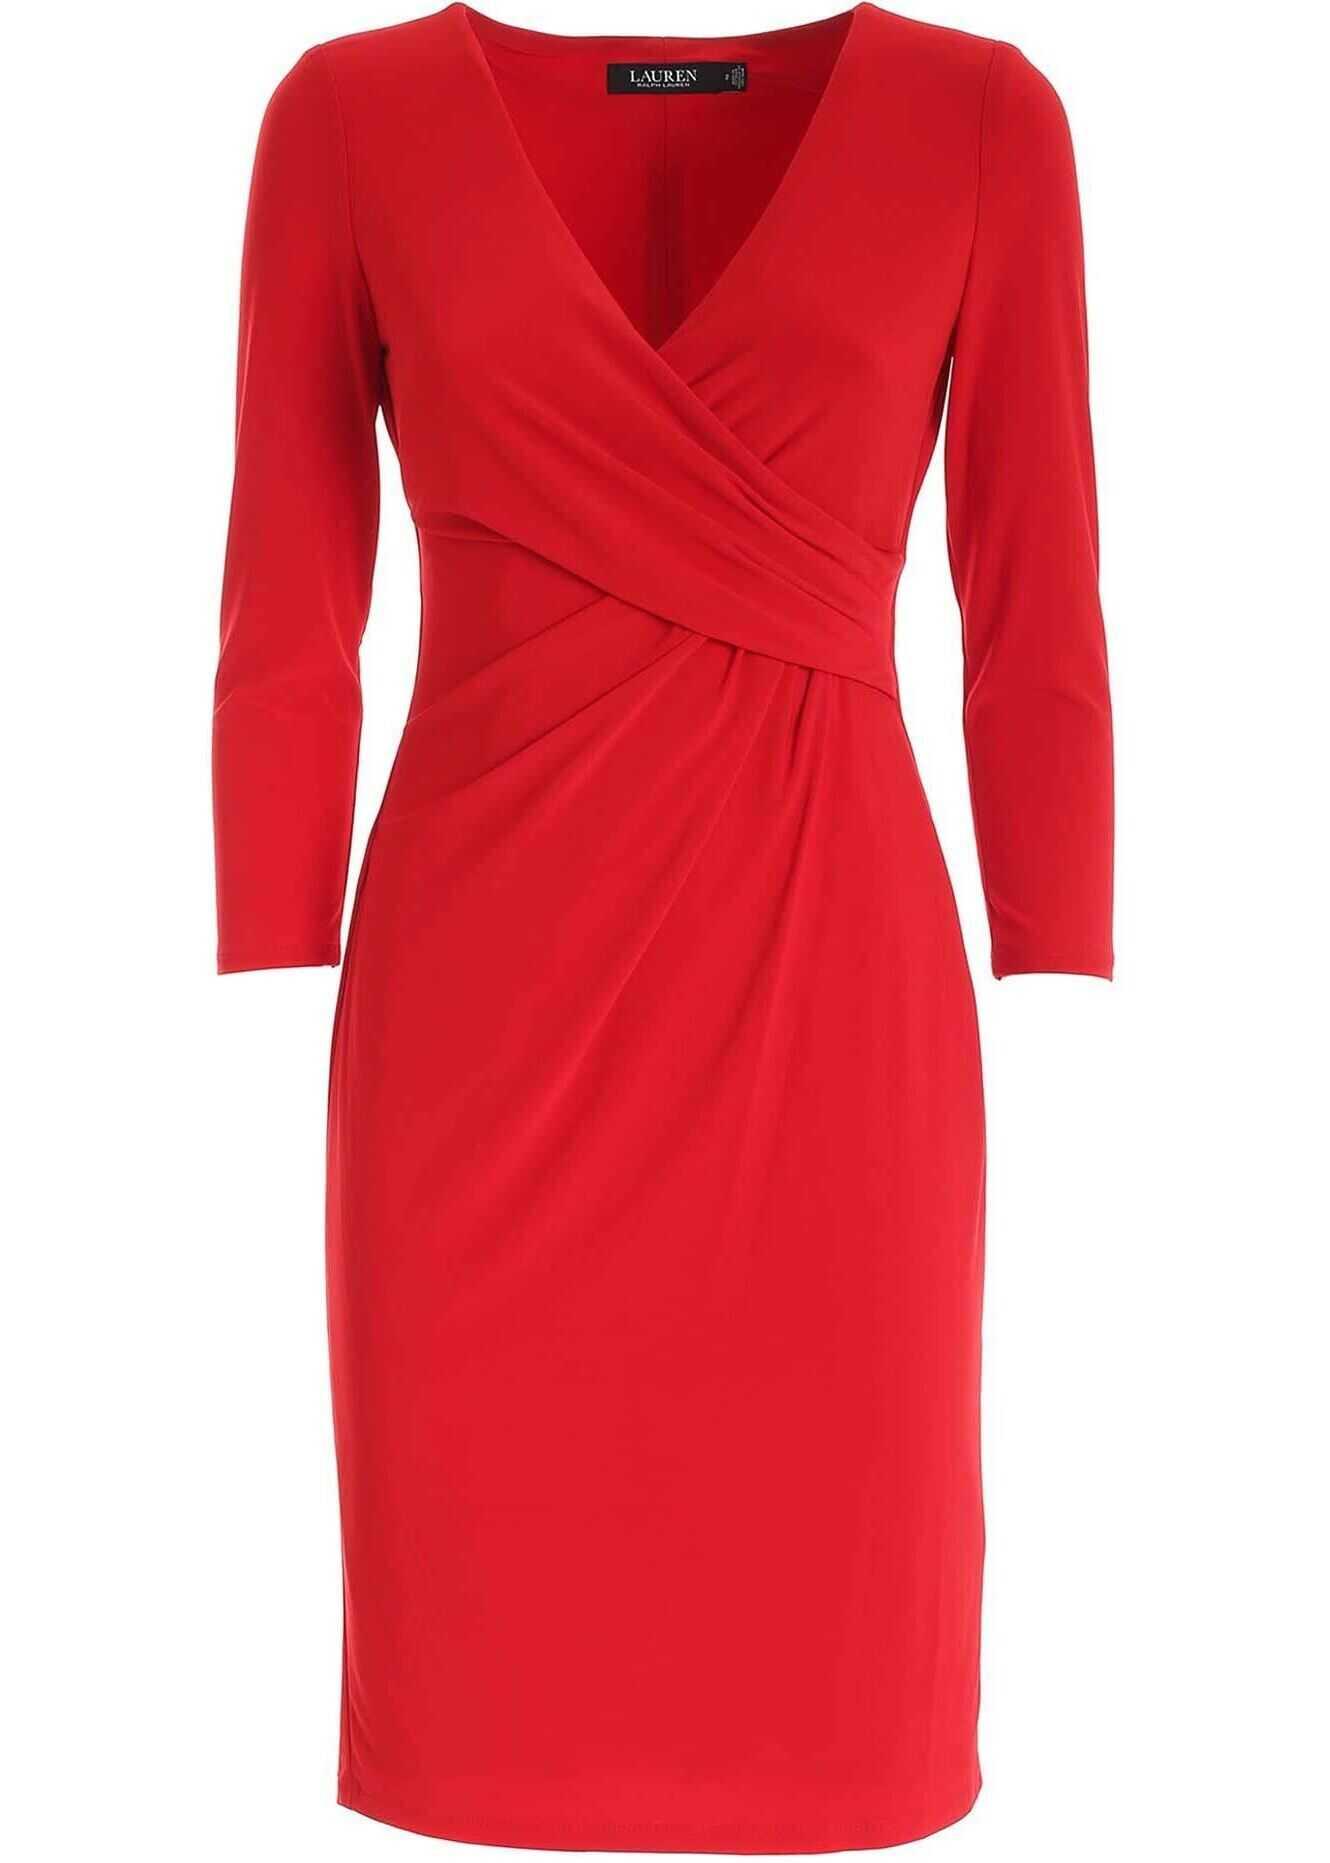 Ralph Lauren Crossover V-Neck Dress In Red* Red